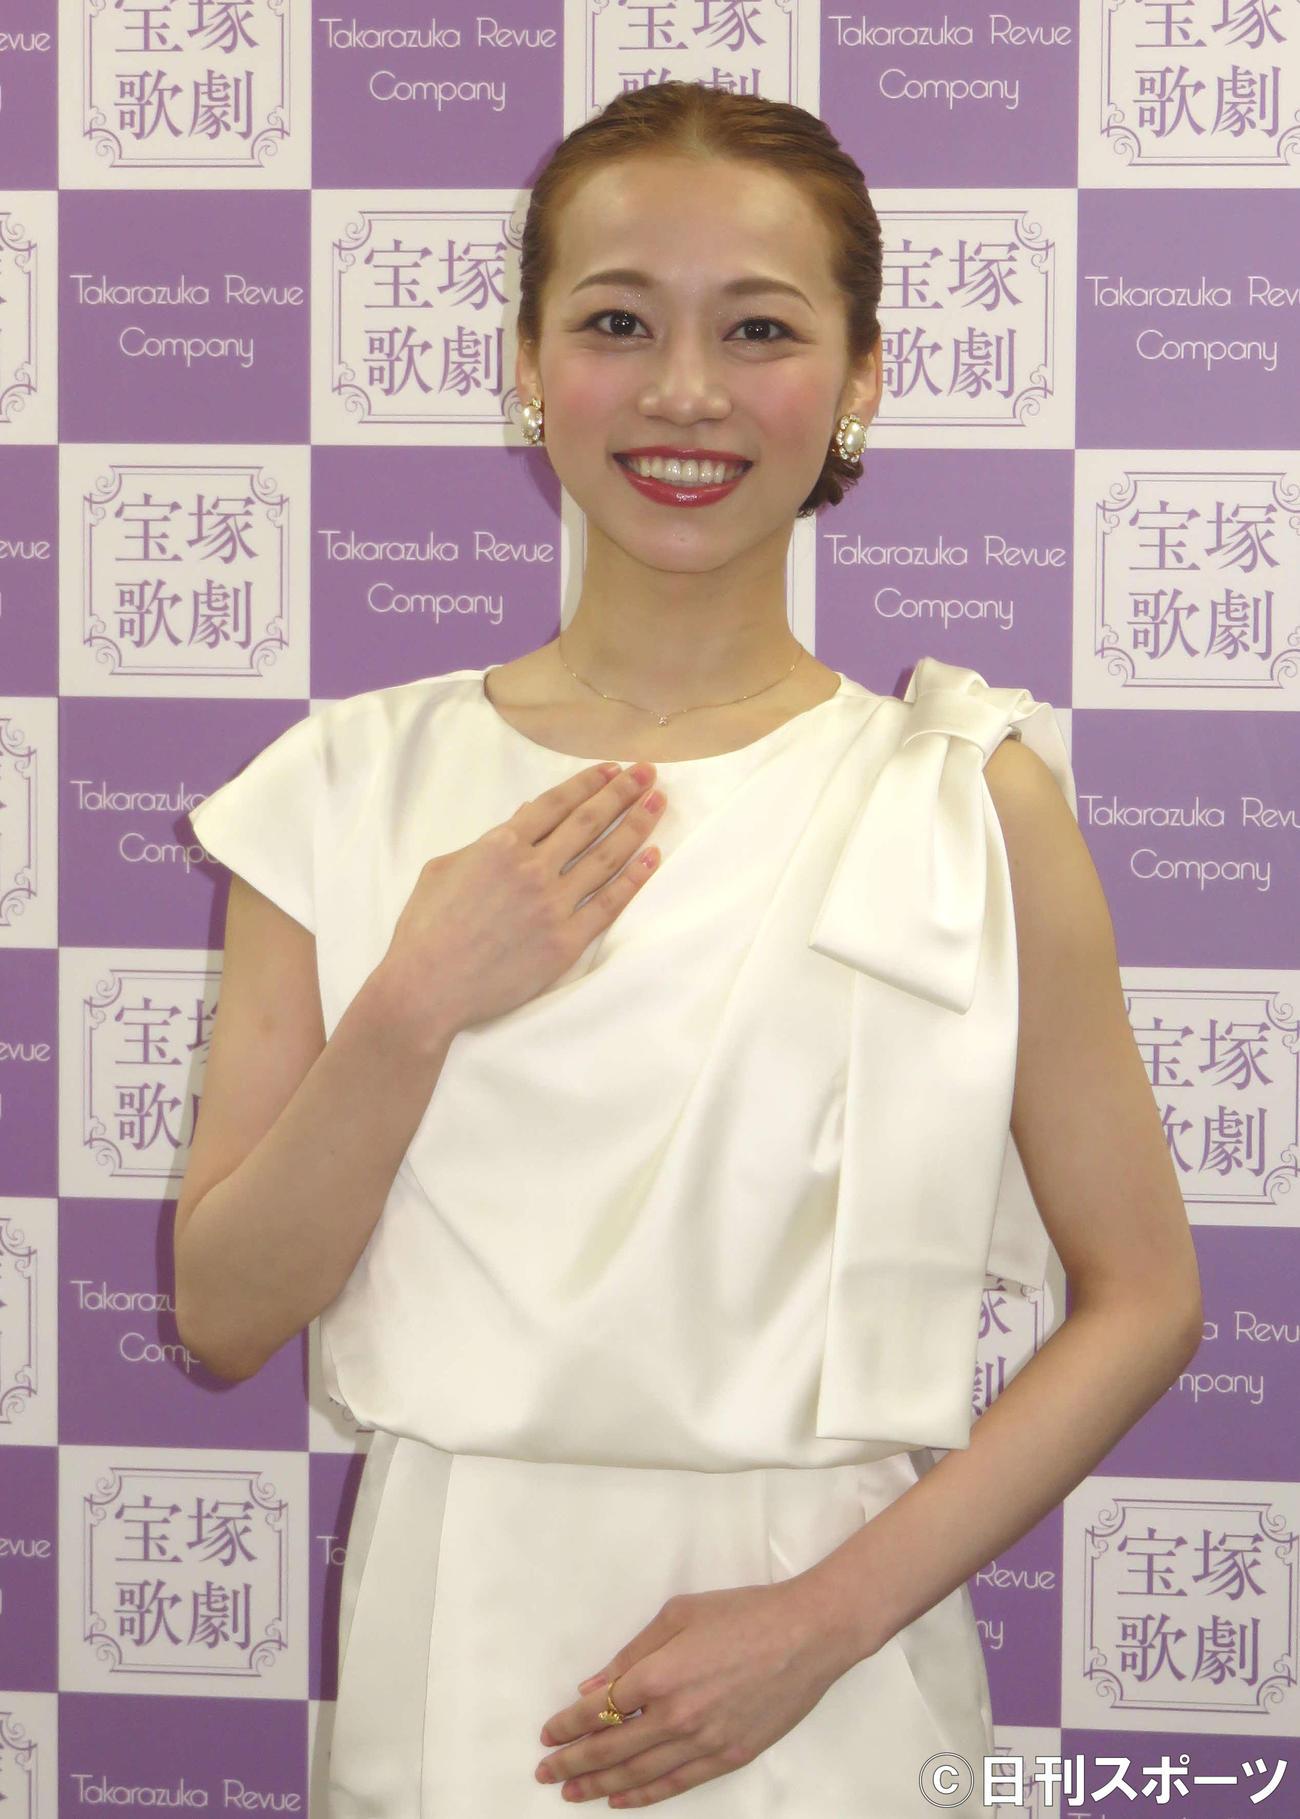 https://www.nikkansports.com/entertainment/news/img/202002180000452-w1300_0.jpg